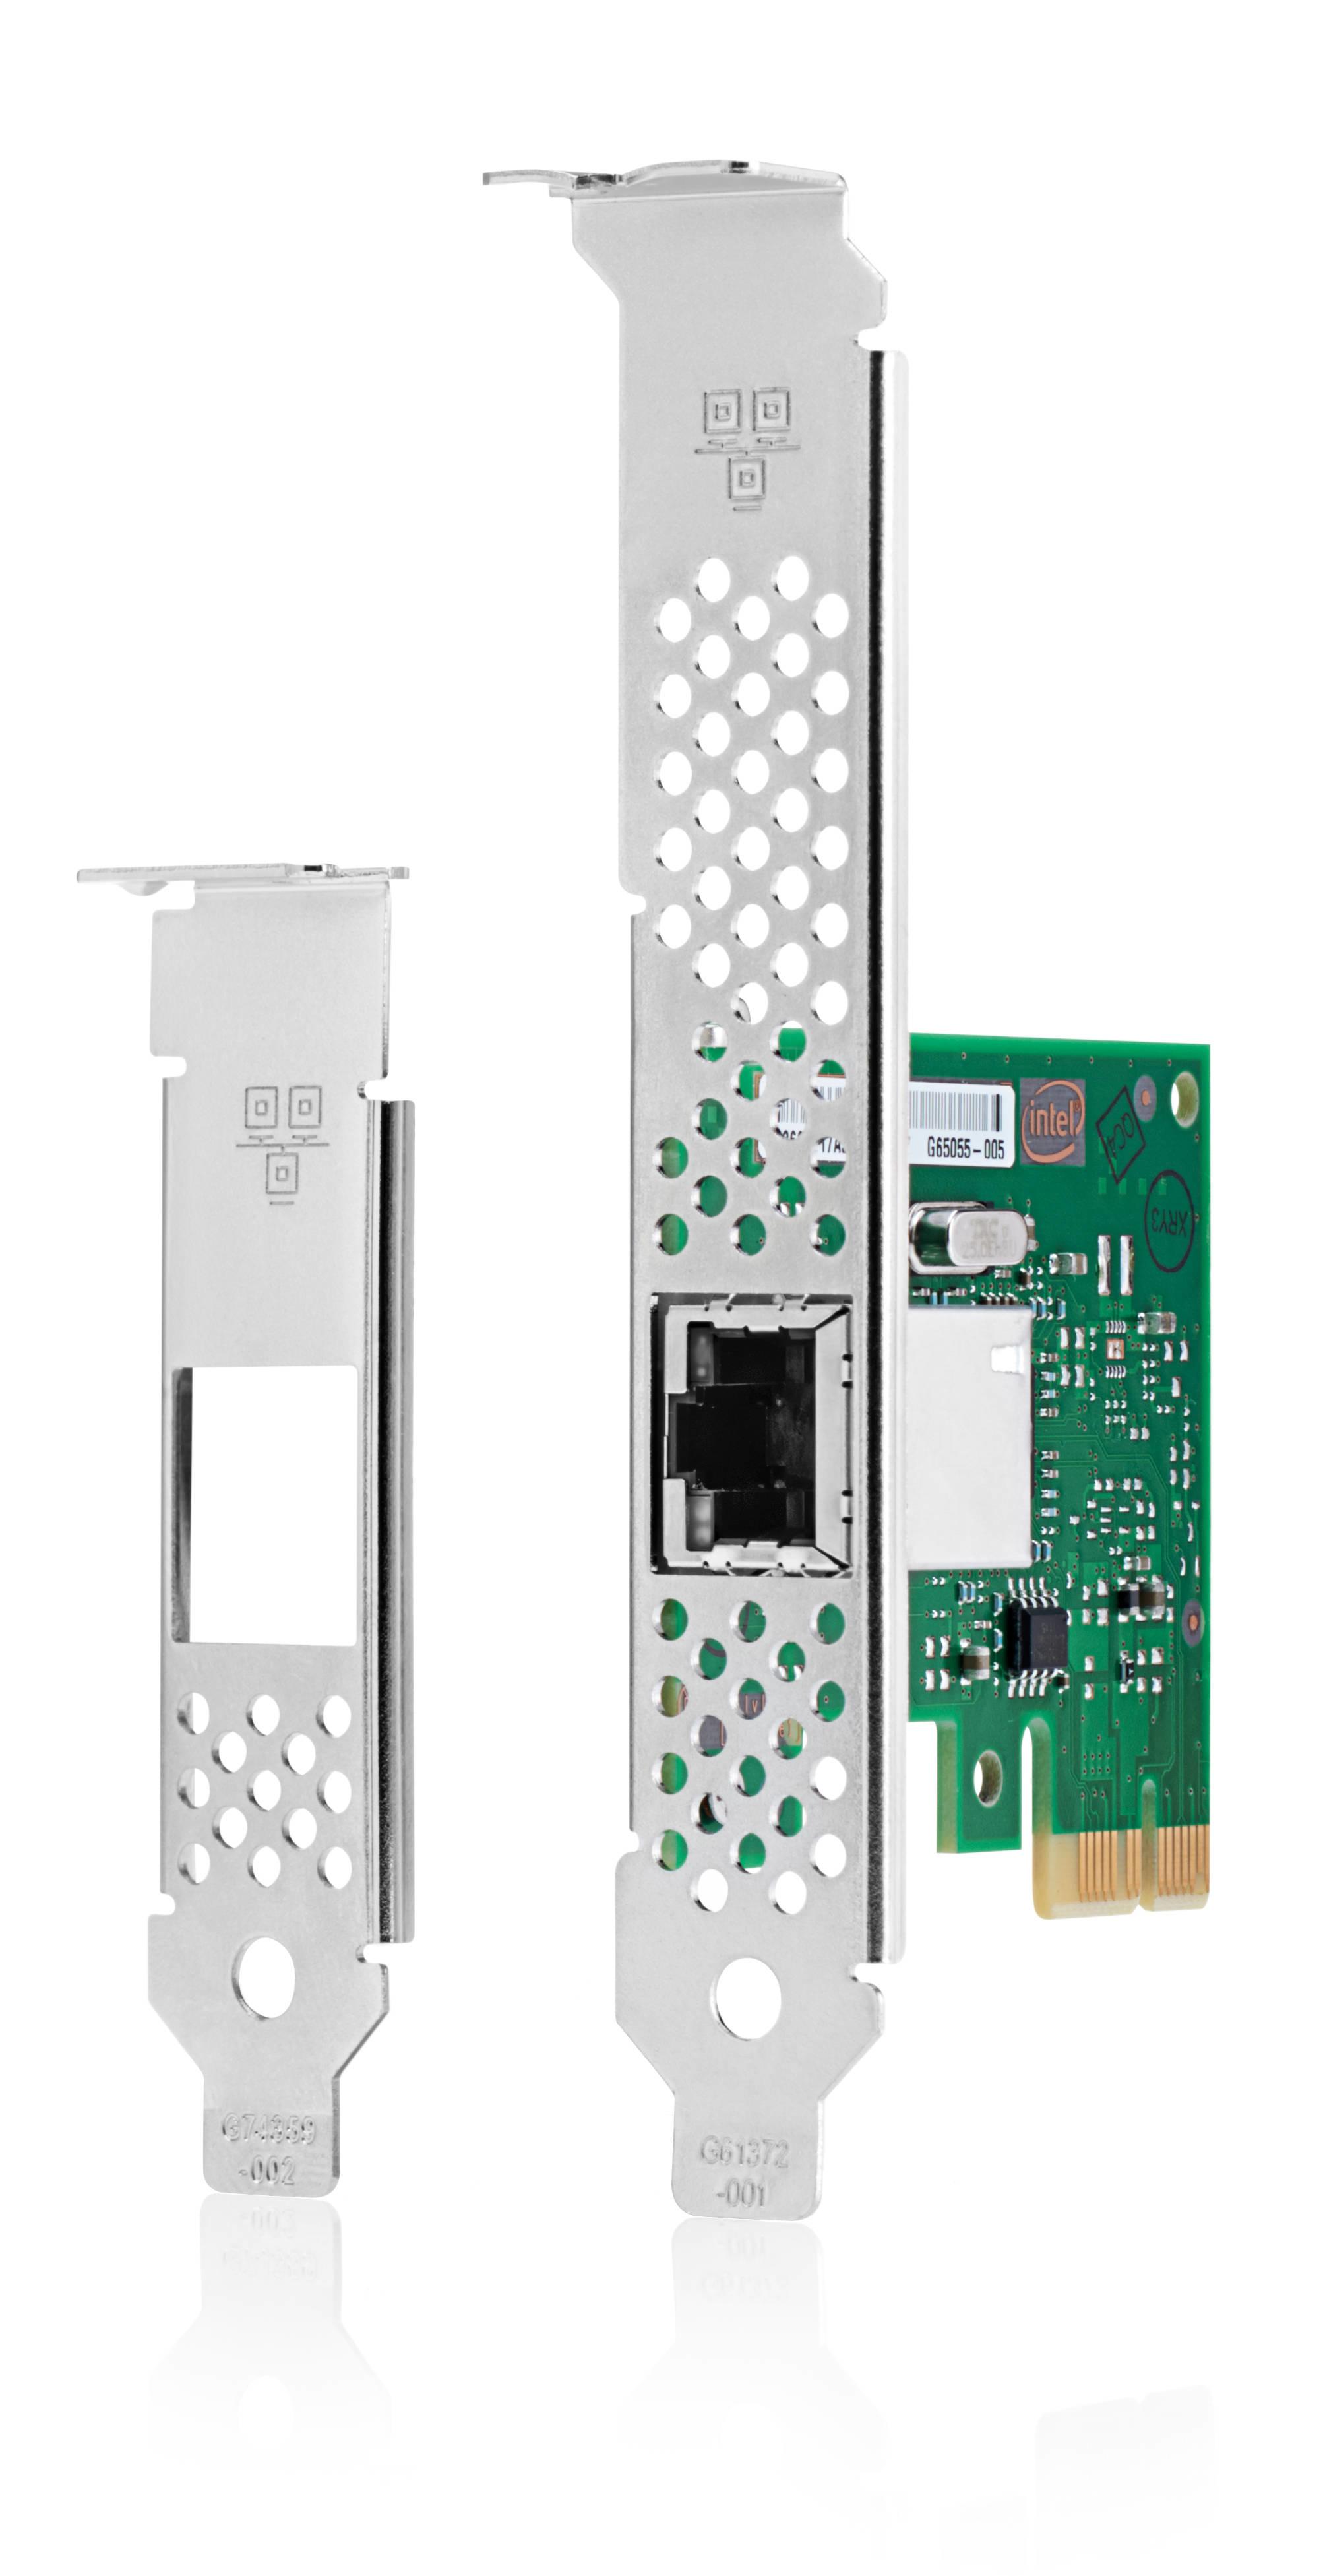 Intel I210-T1 - Network adapter - PCIe 2.1 low profile - Gigabit Ethernet x 1 - for HP 280 G4 Desktop Pro A 300 G3 Pro A G2 ProDesk 400 G6 600 G5 Workstation Z1 G5